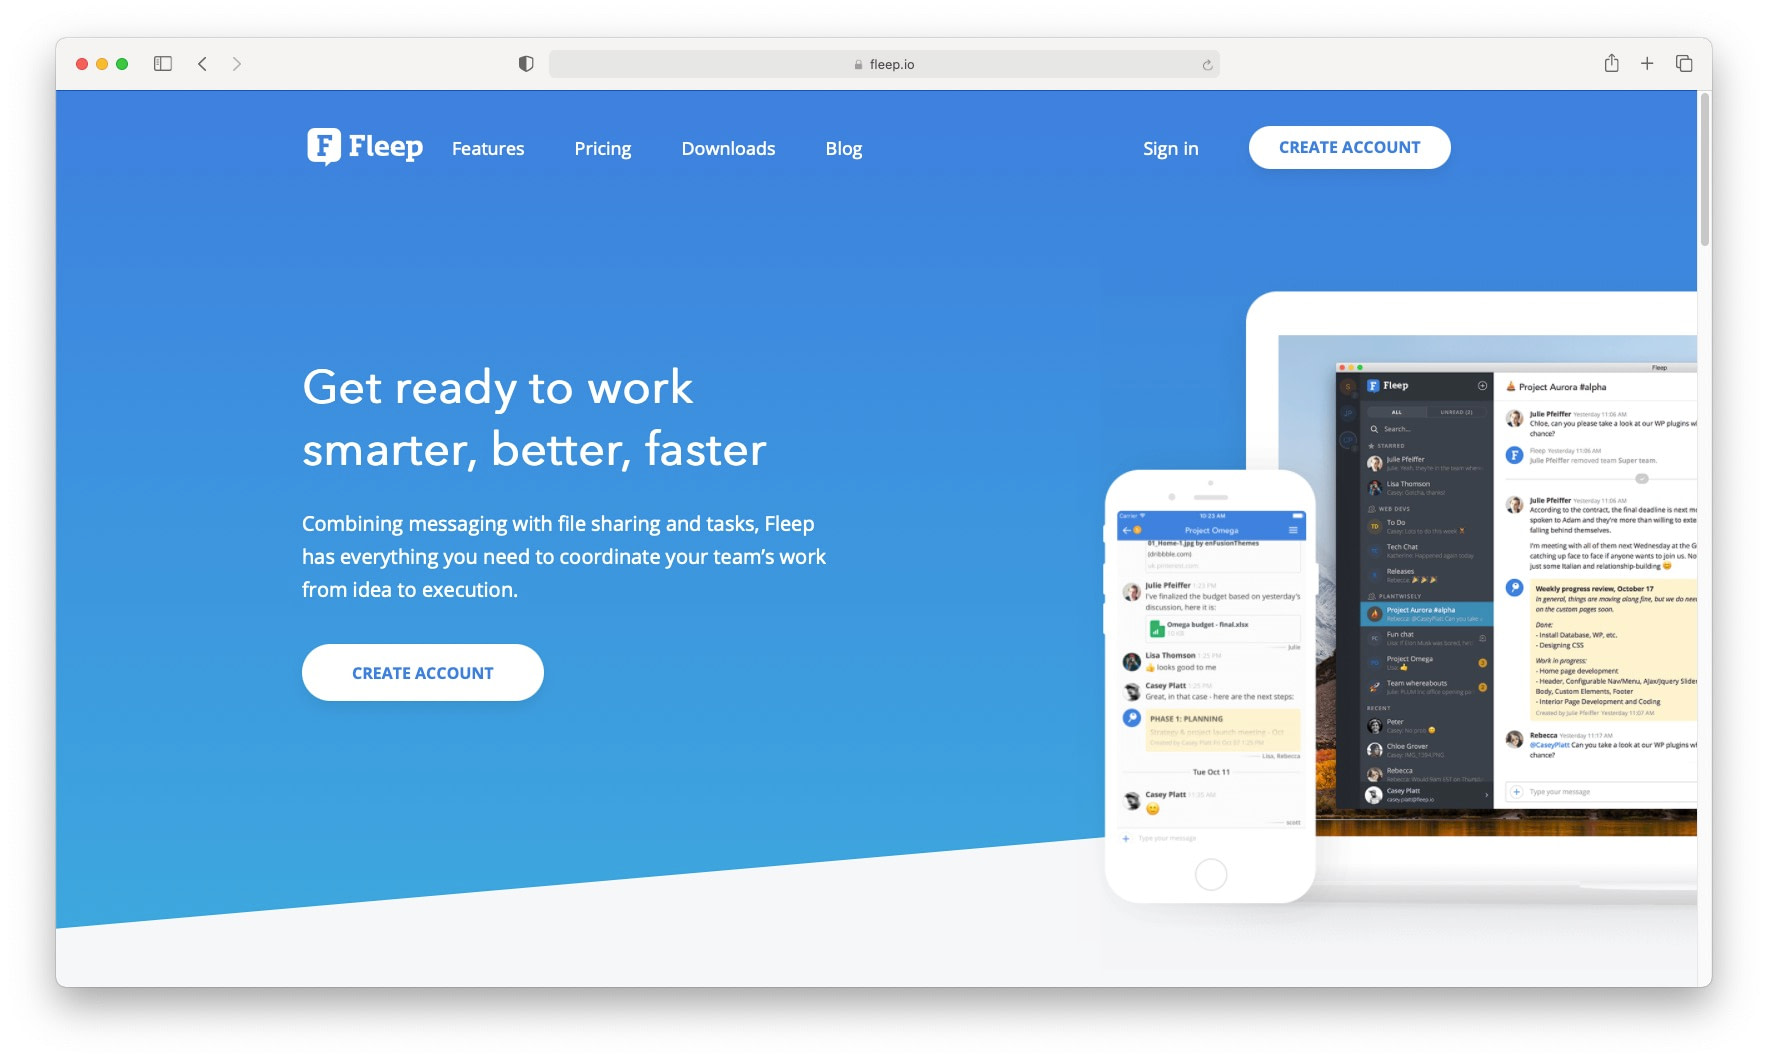 Fleep is one of the best free Slack alternatives